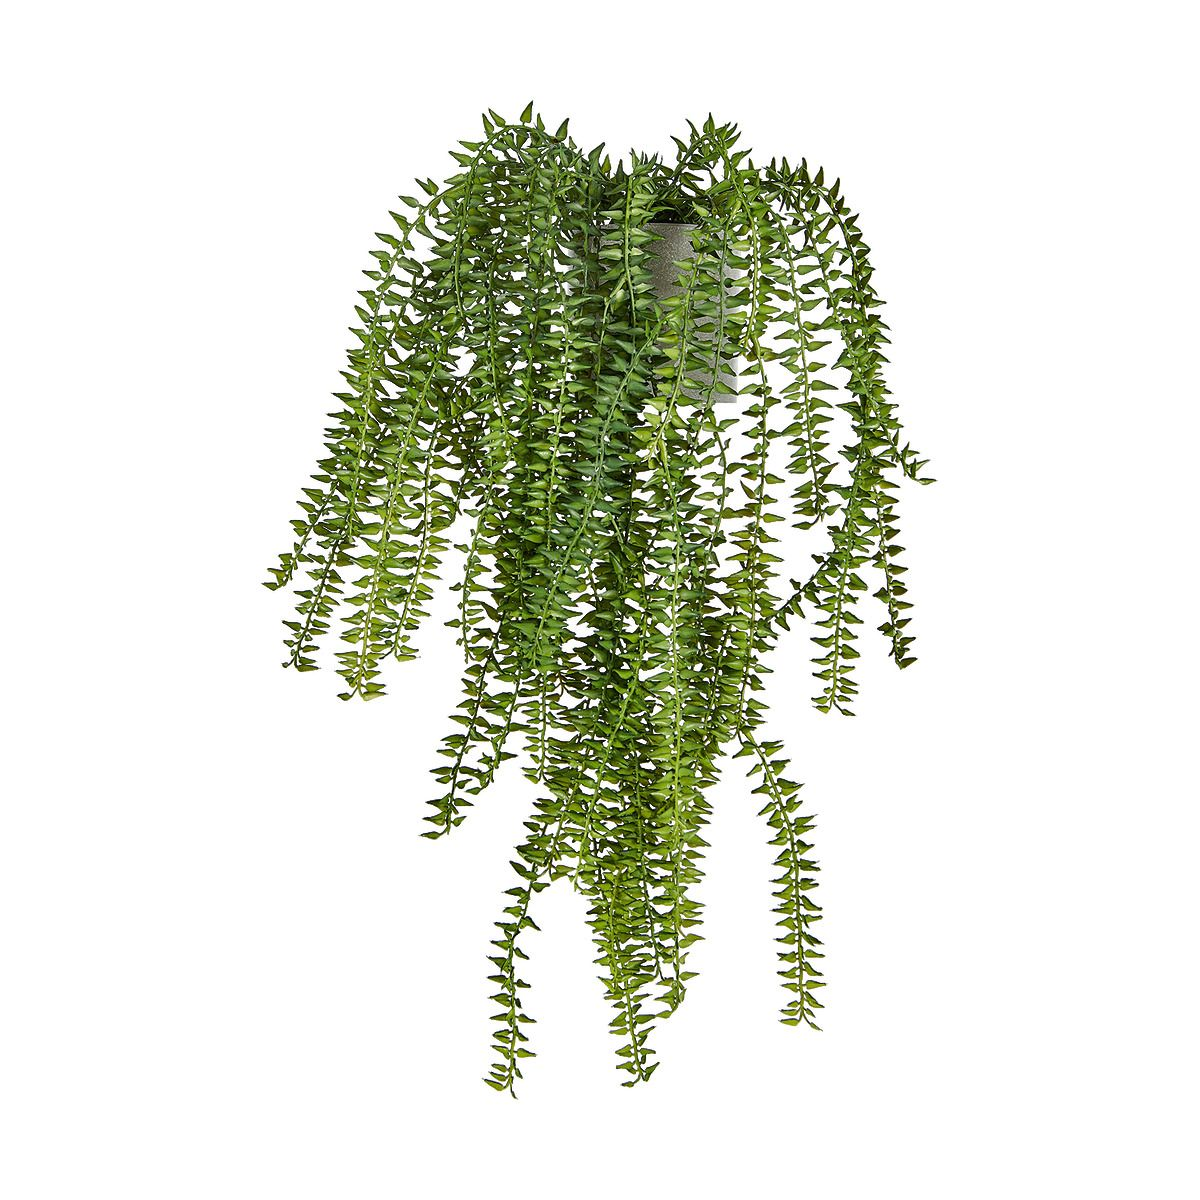 Plante Tombante Artificielle Vert H94cm Alinea En 2020